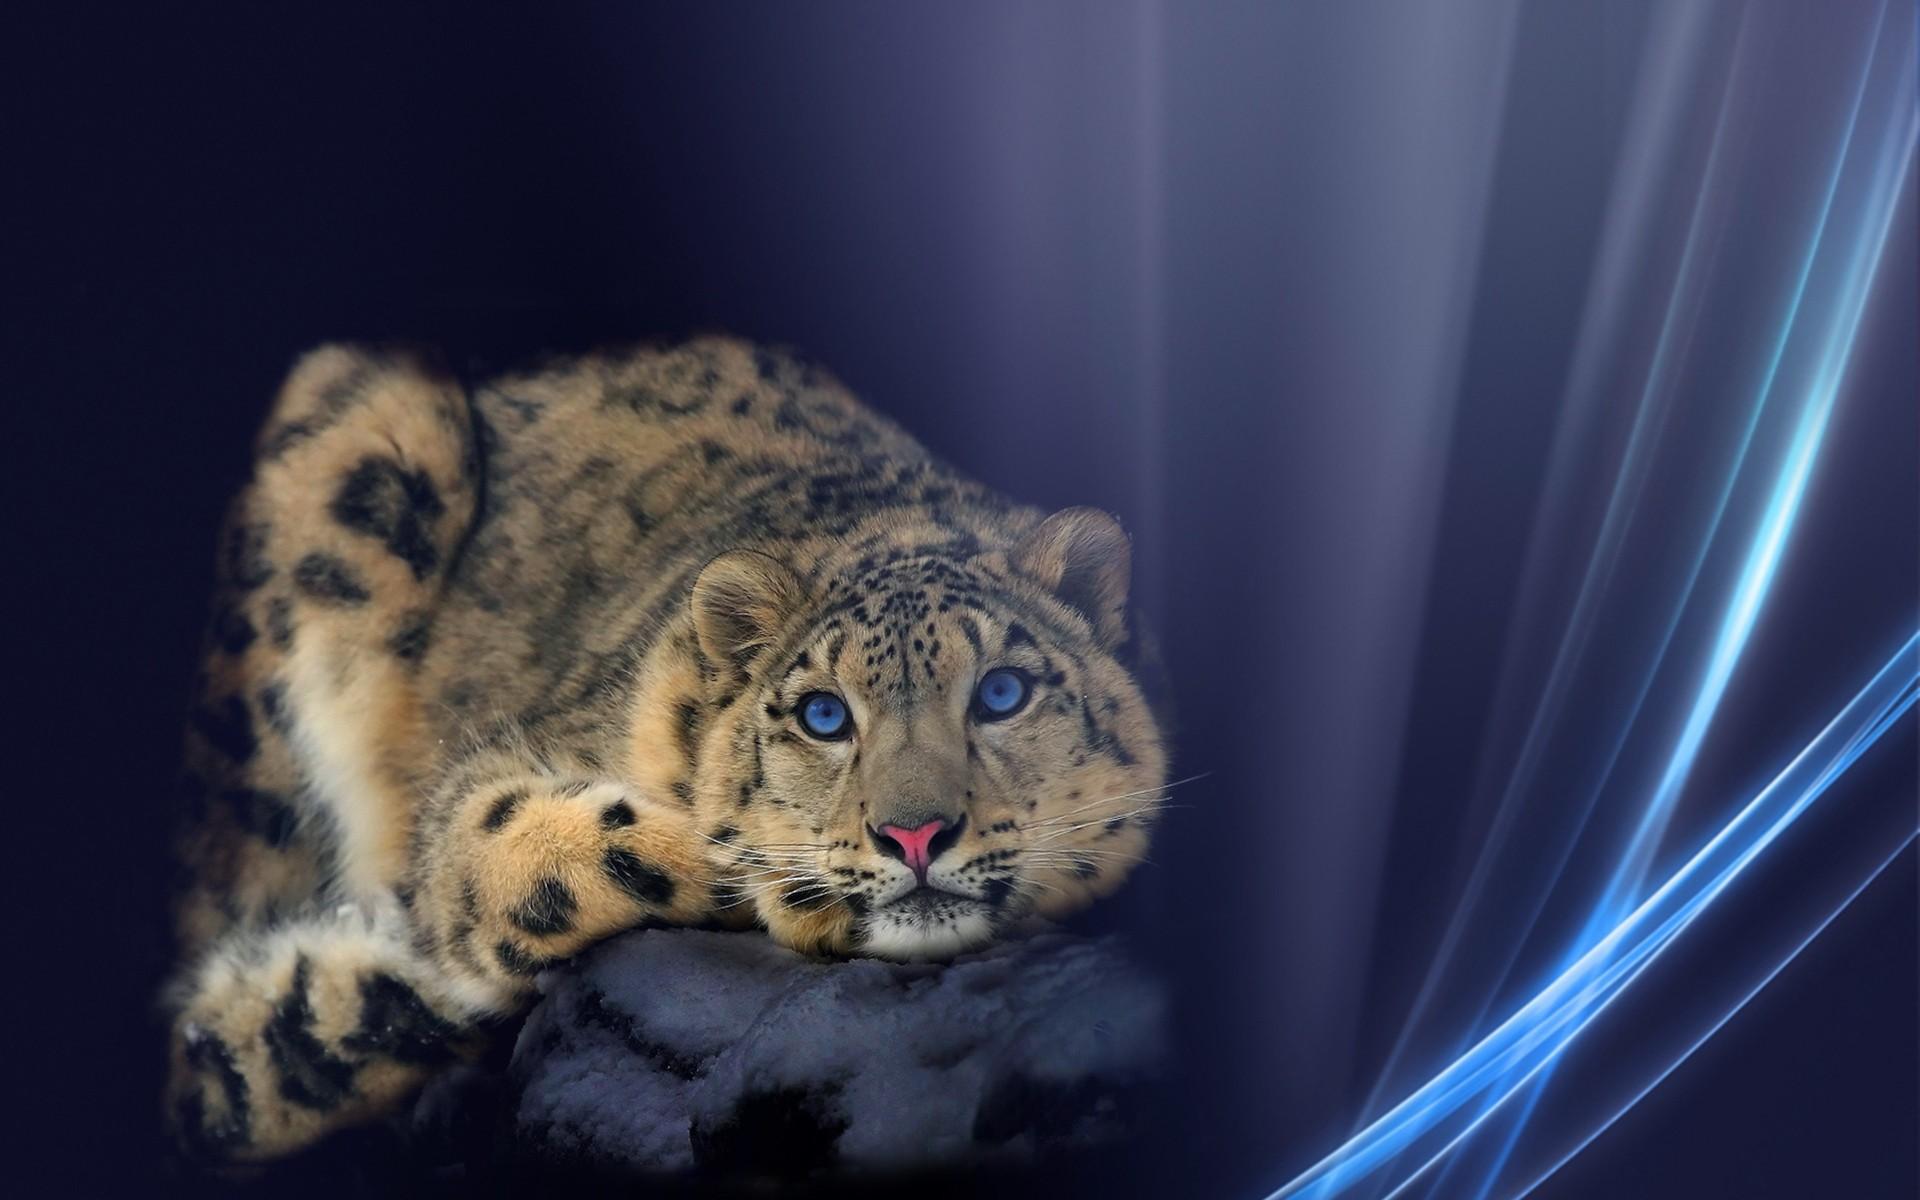 Wallpaper - Leopard Lion With Horns Fantasy - HD Wallpaper